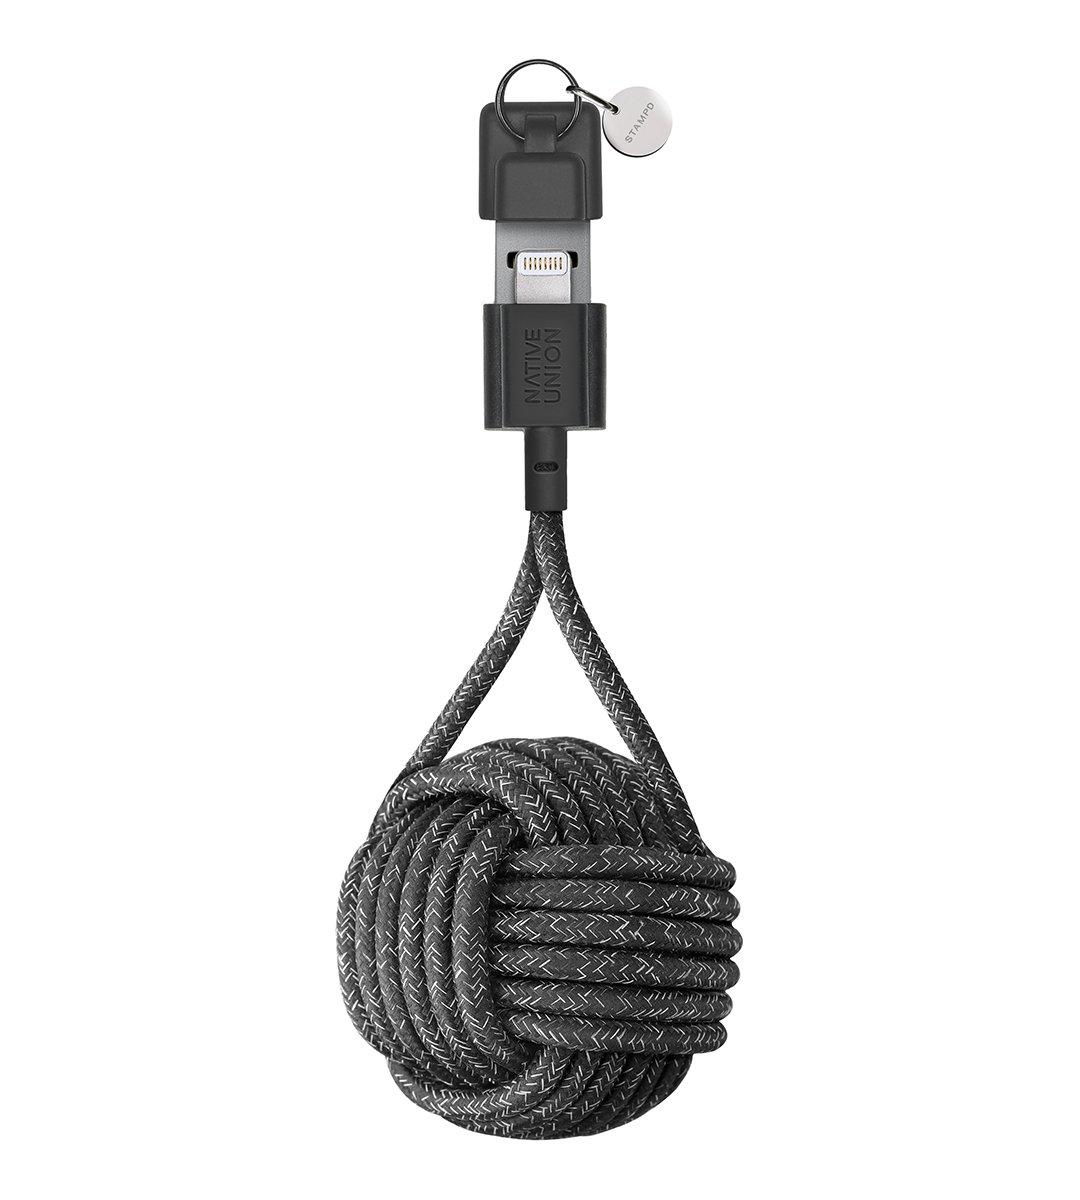 Native Union Key Cable USB a Lightning: Amazon.es: Electrónica